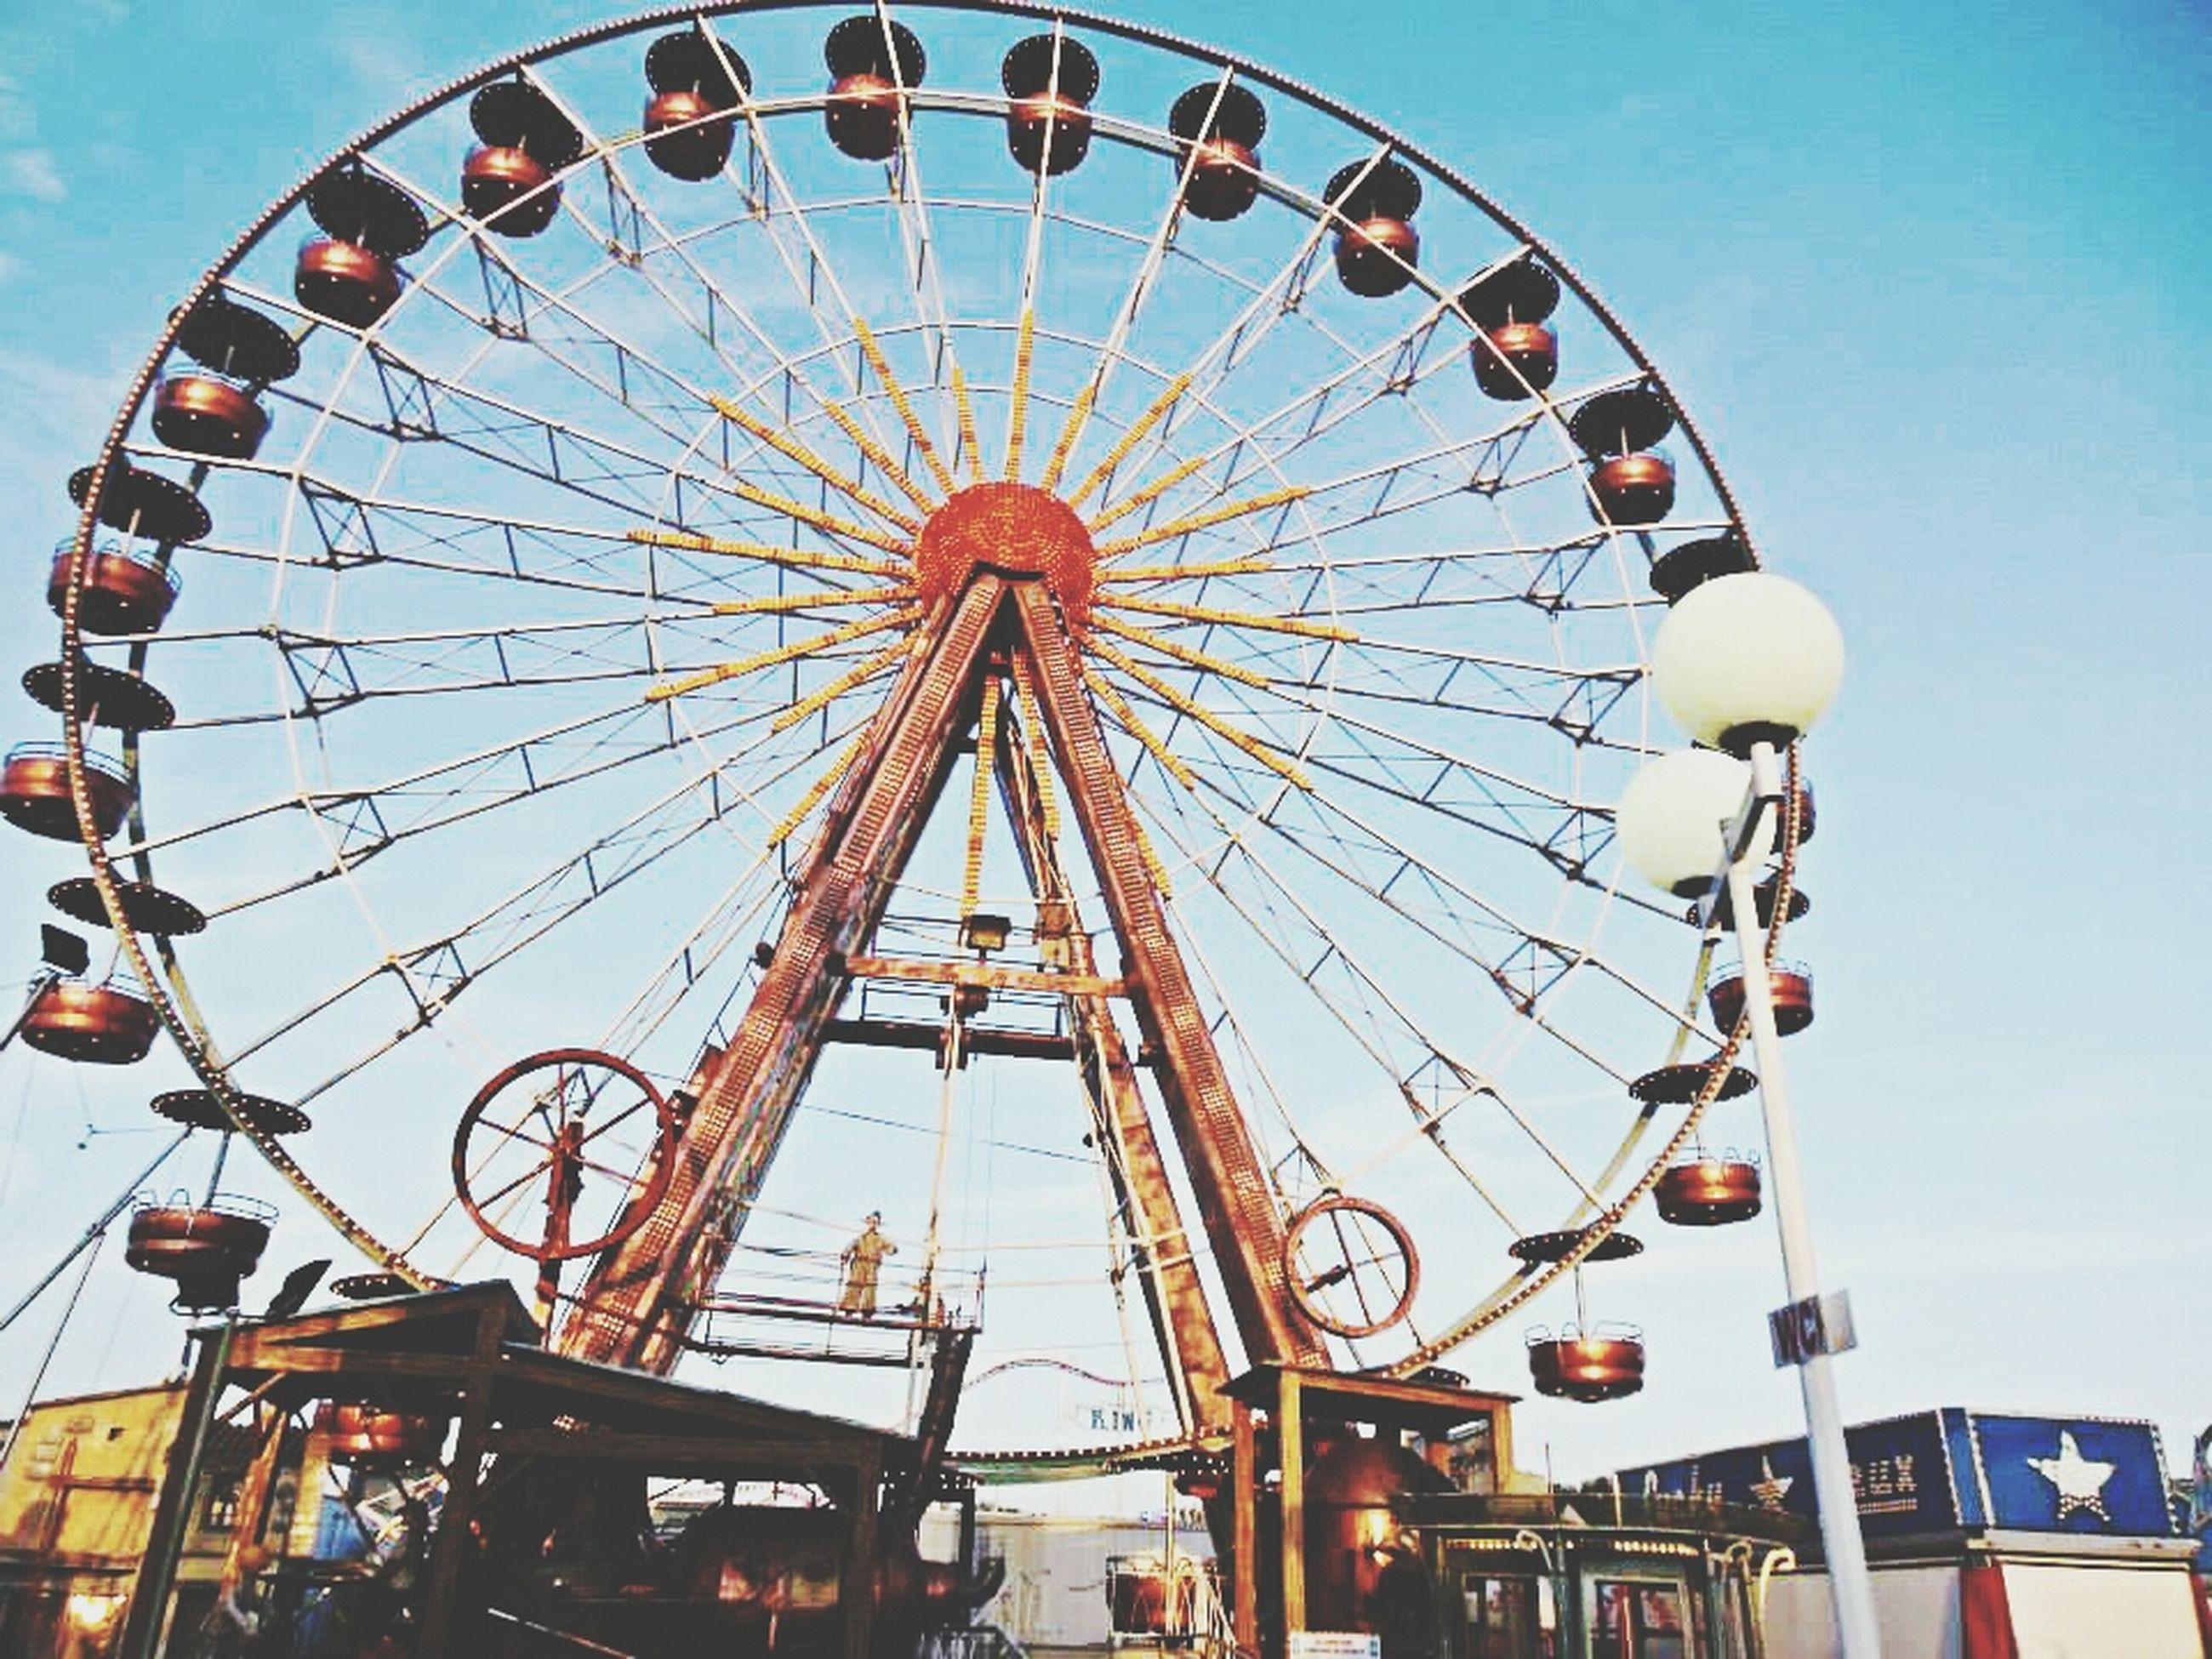 amusement park, amusement park ride, ferris wheel, arts culture and entertainment, low angle view, sky, fun, enjoyment, built structure, multi colored, fairground ride, leisure activity, day, outdoors, architecture, metal, chain swing ride, blue, fairground, large